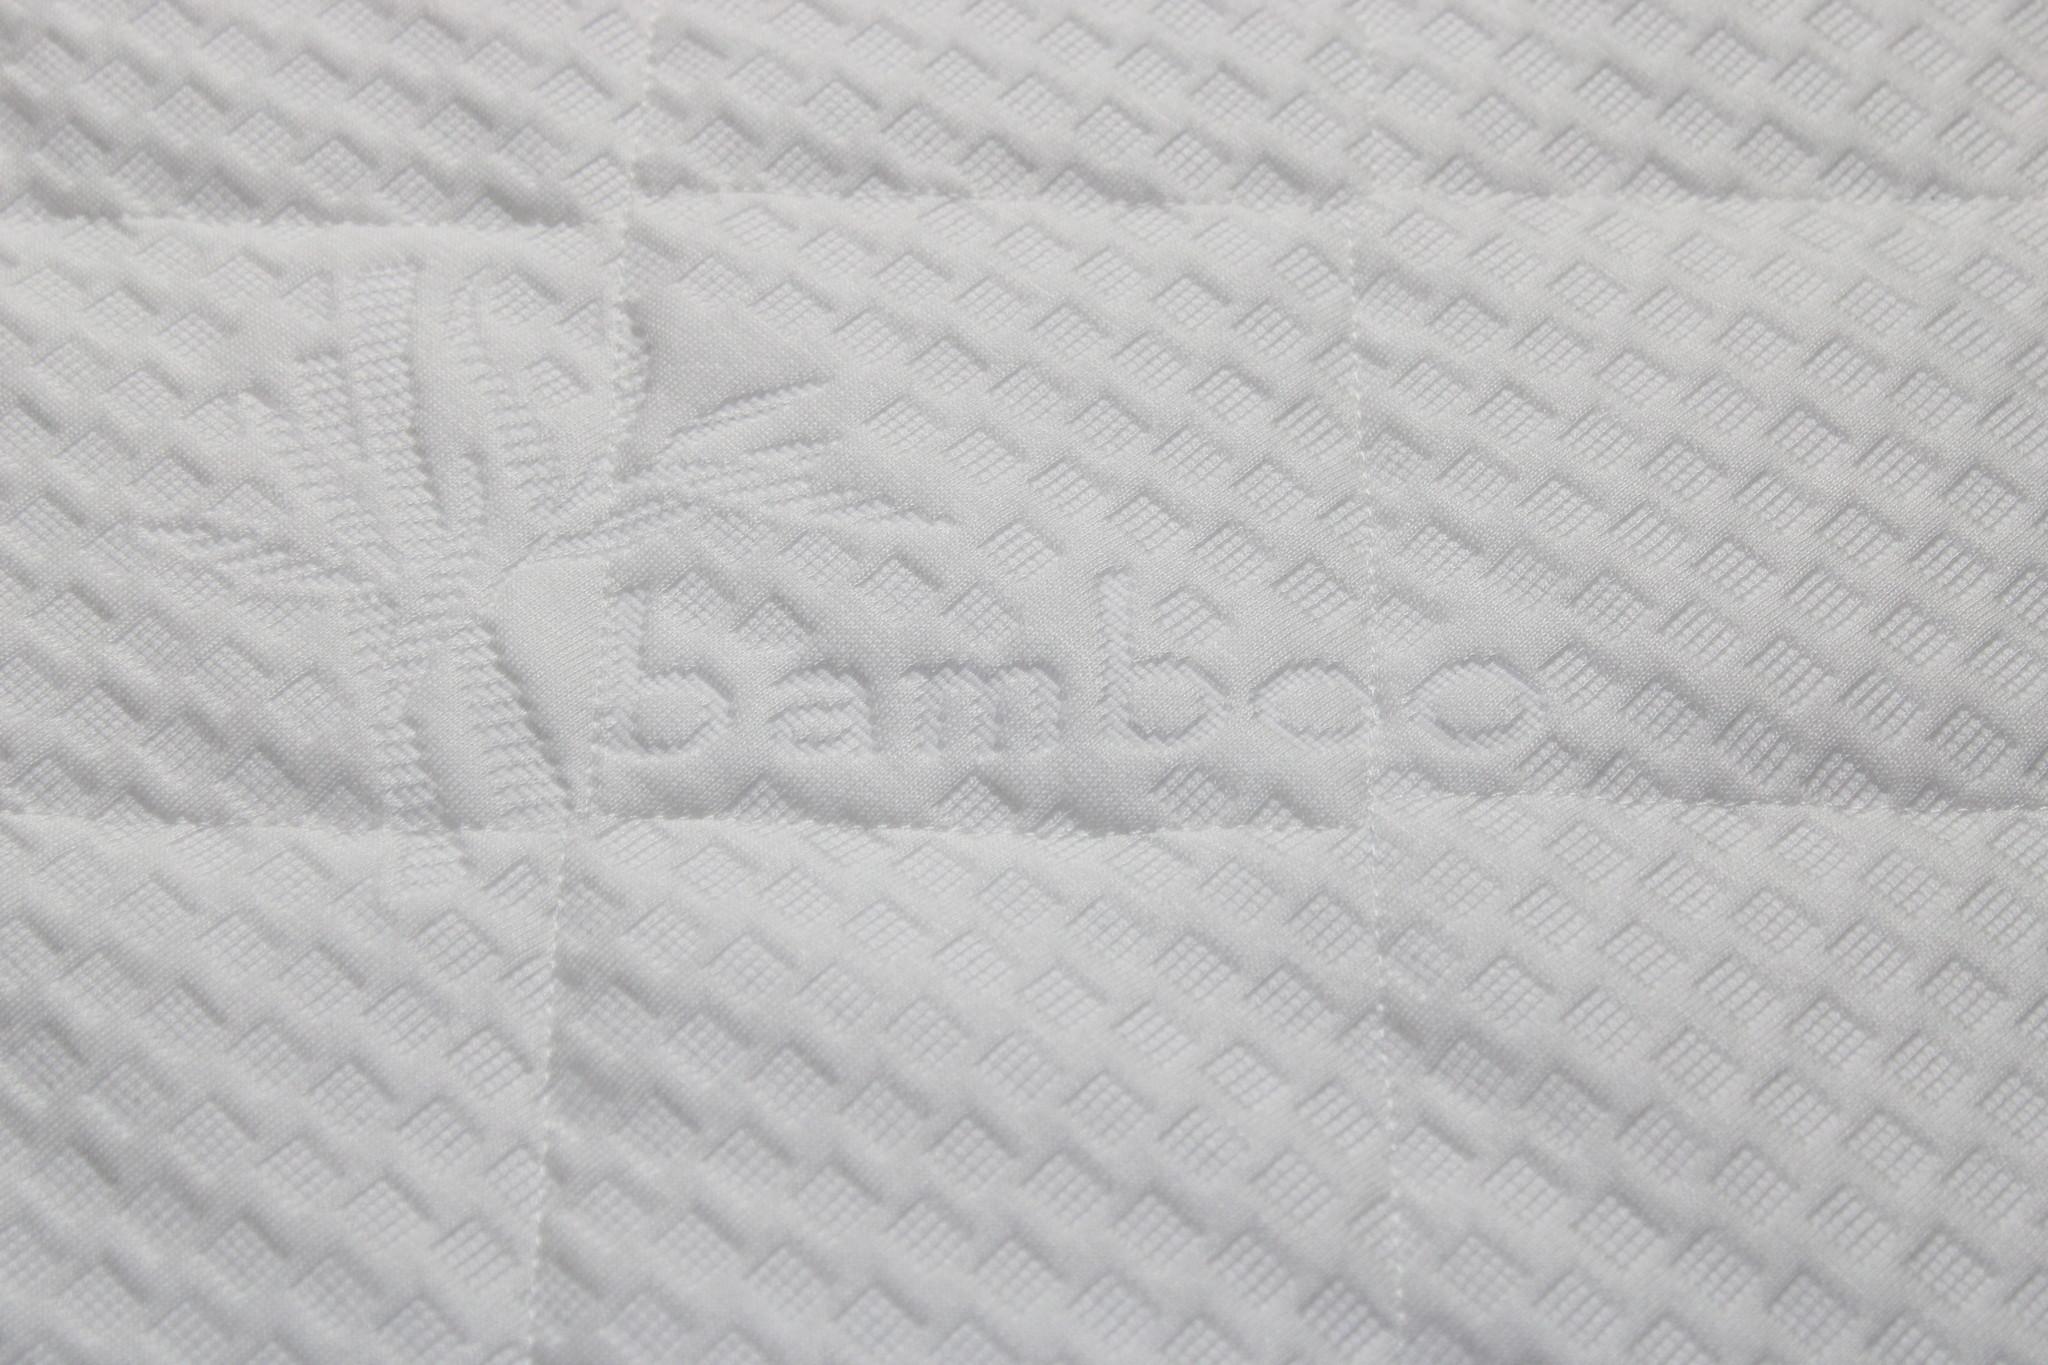 Sarpy Kindermatras 80x200 koudschuim HR55 bamboo